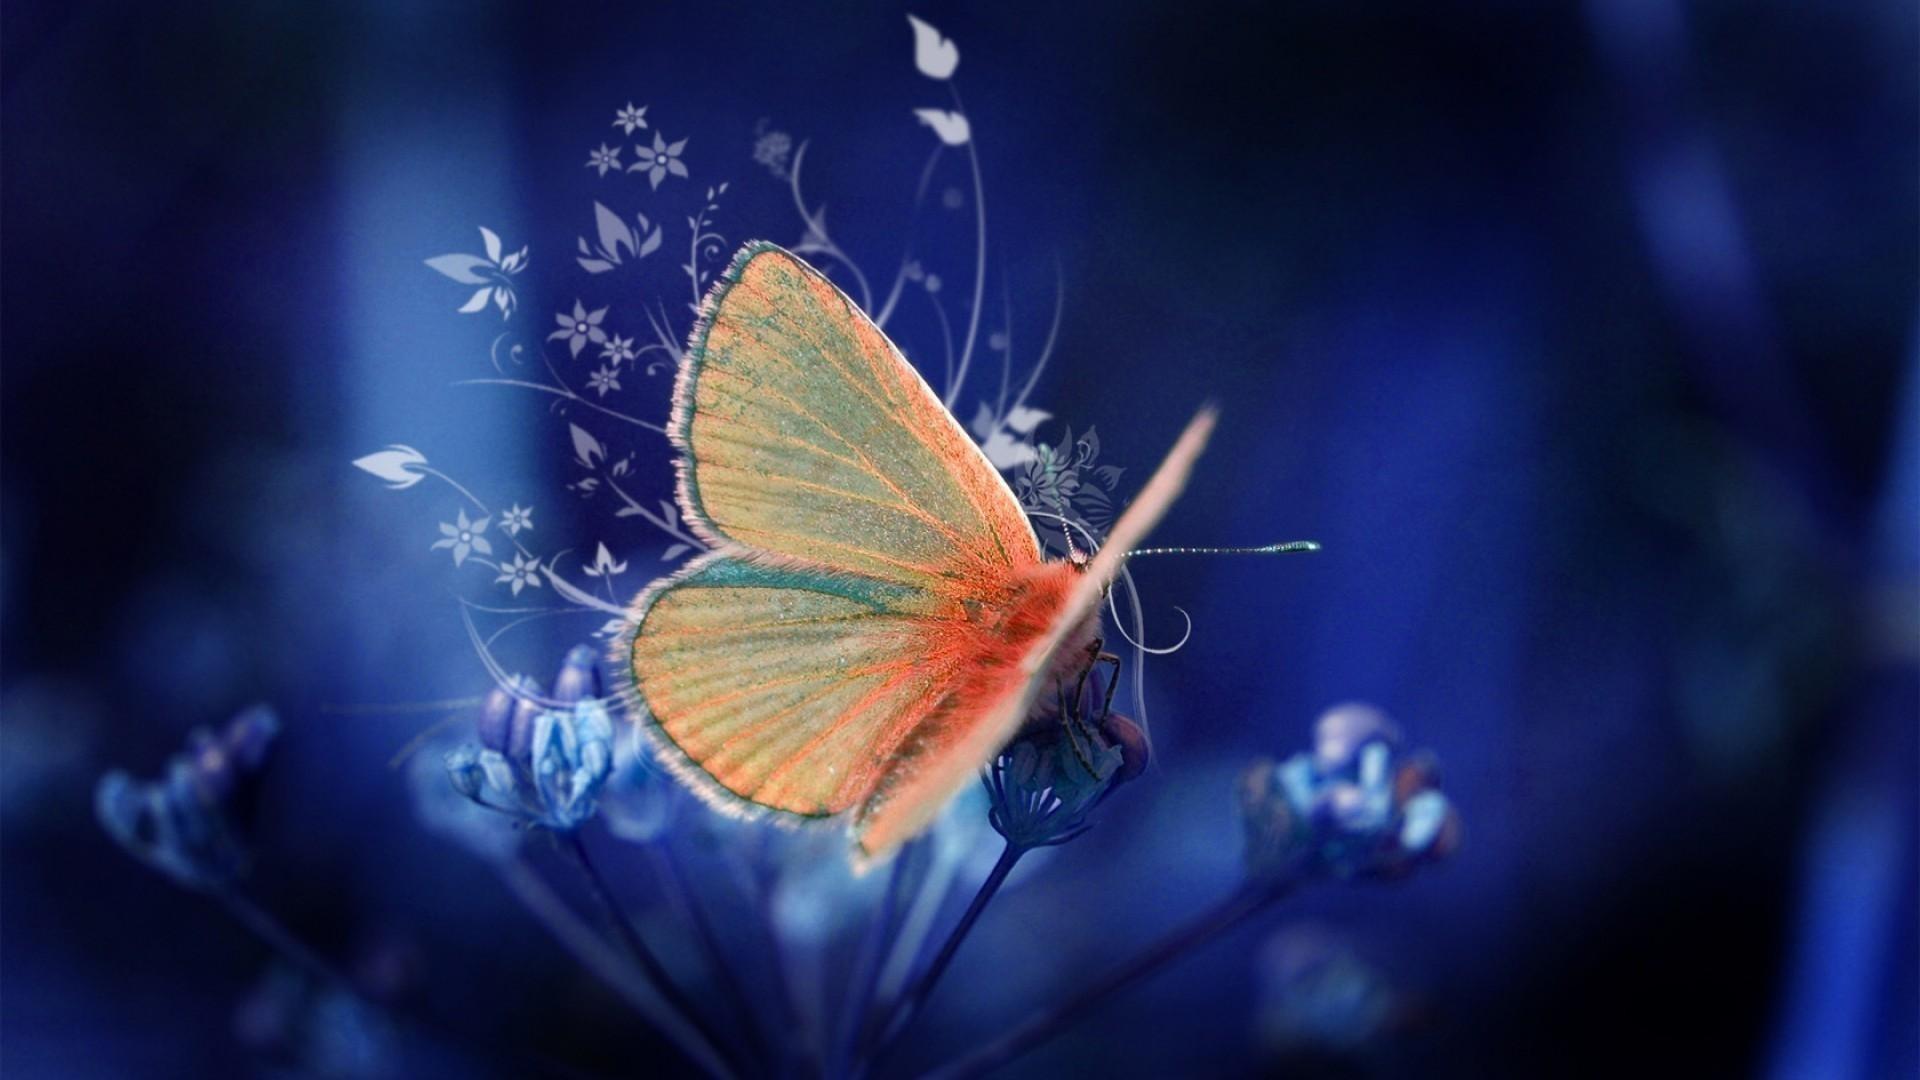 Res: 1920x1080, 1920x1200 3D+Butterfly | 3D Blue fractal Butterfly, 3D, Abstract, Black,  Blue